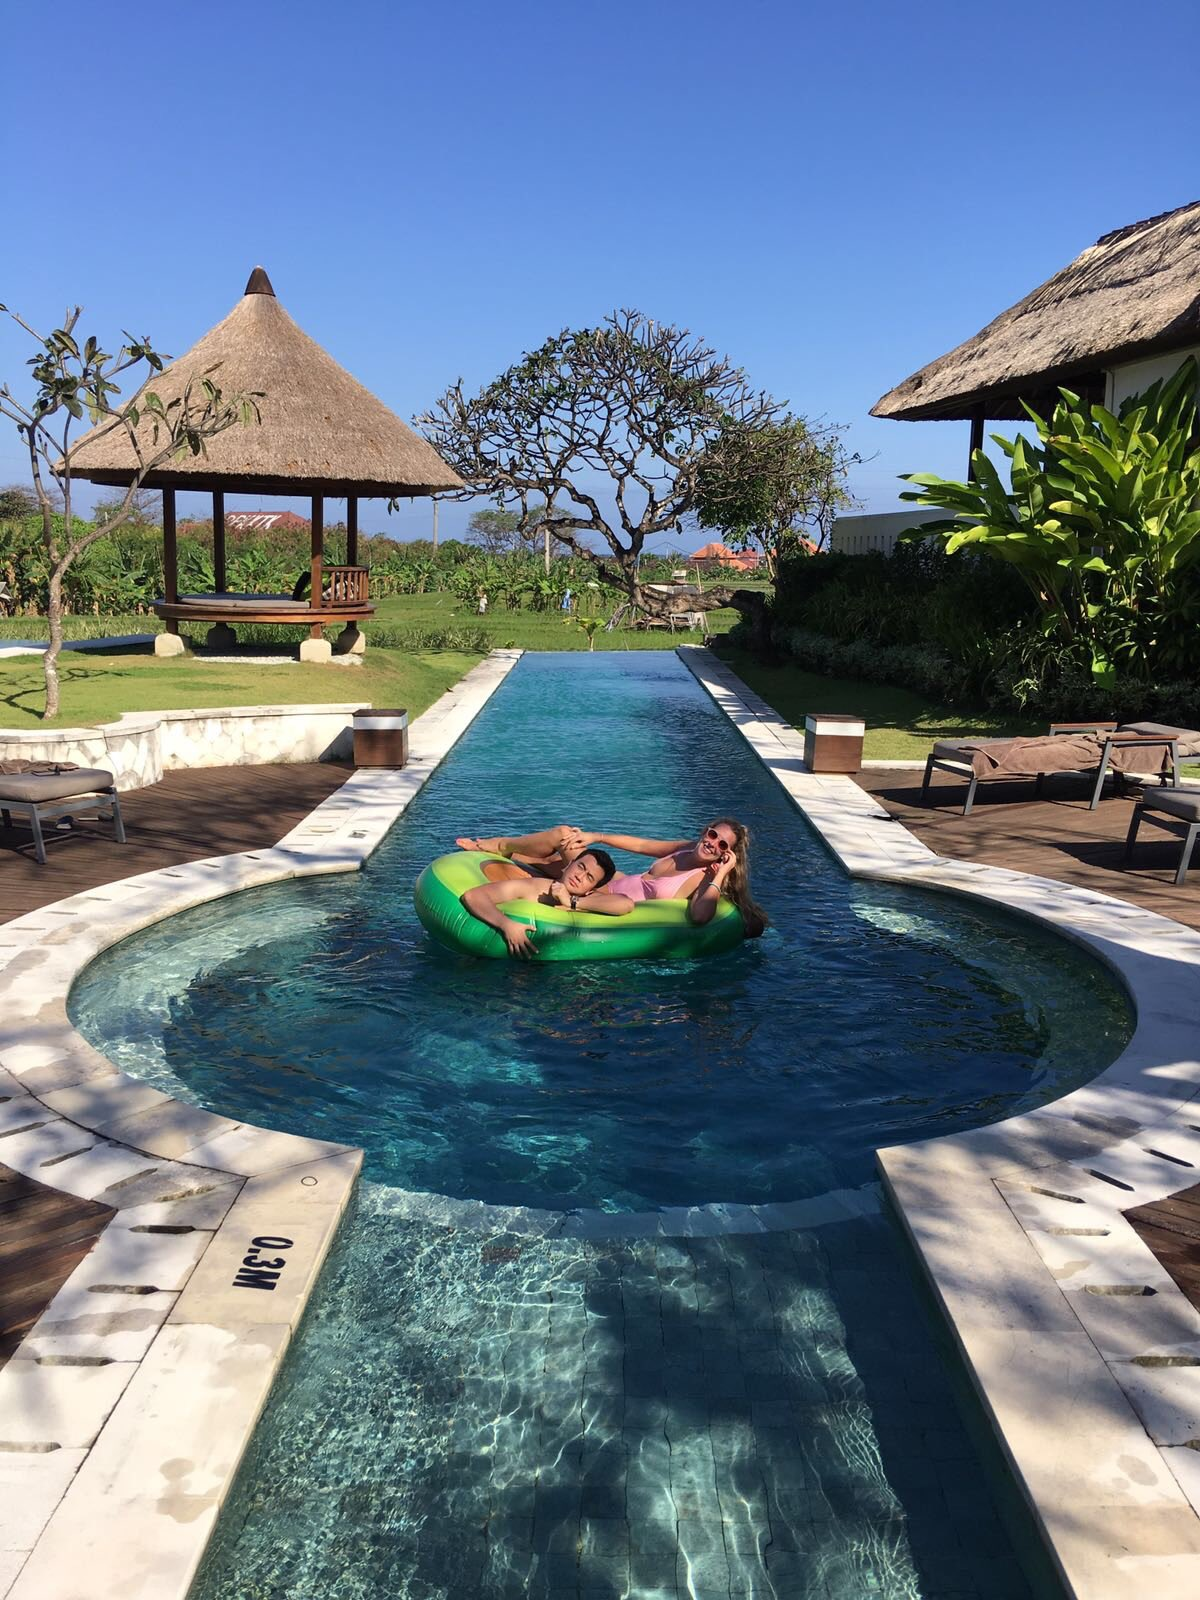 The Samata Bali - Destination Deluxe